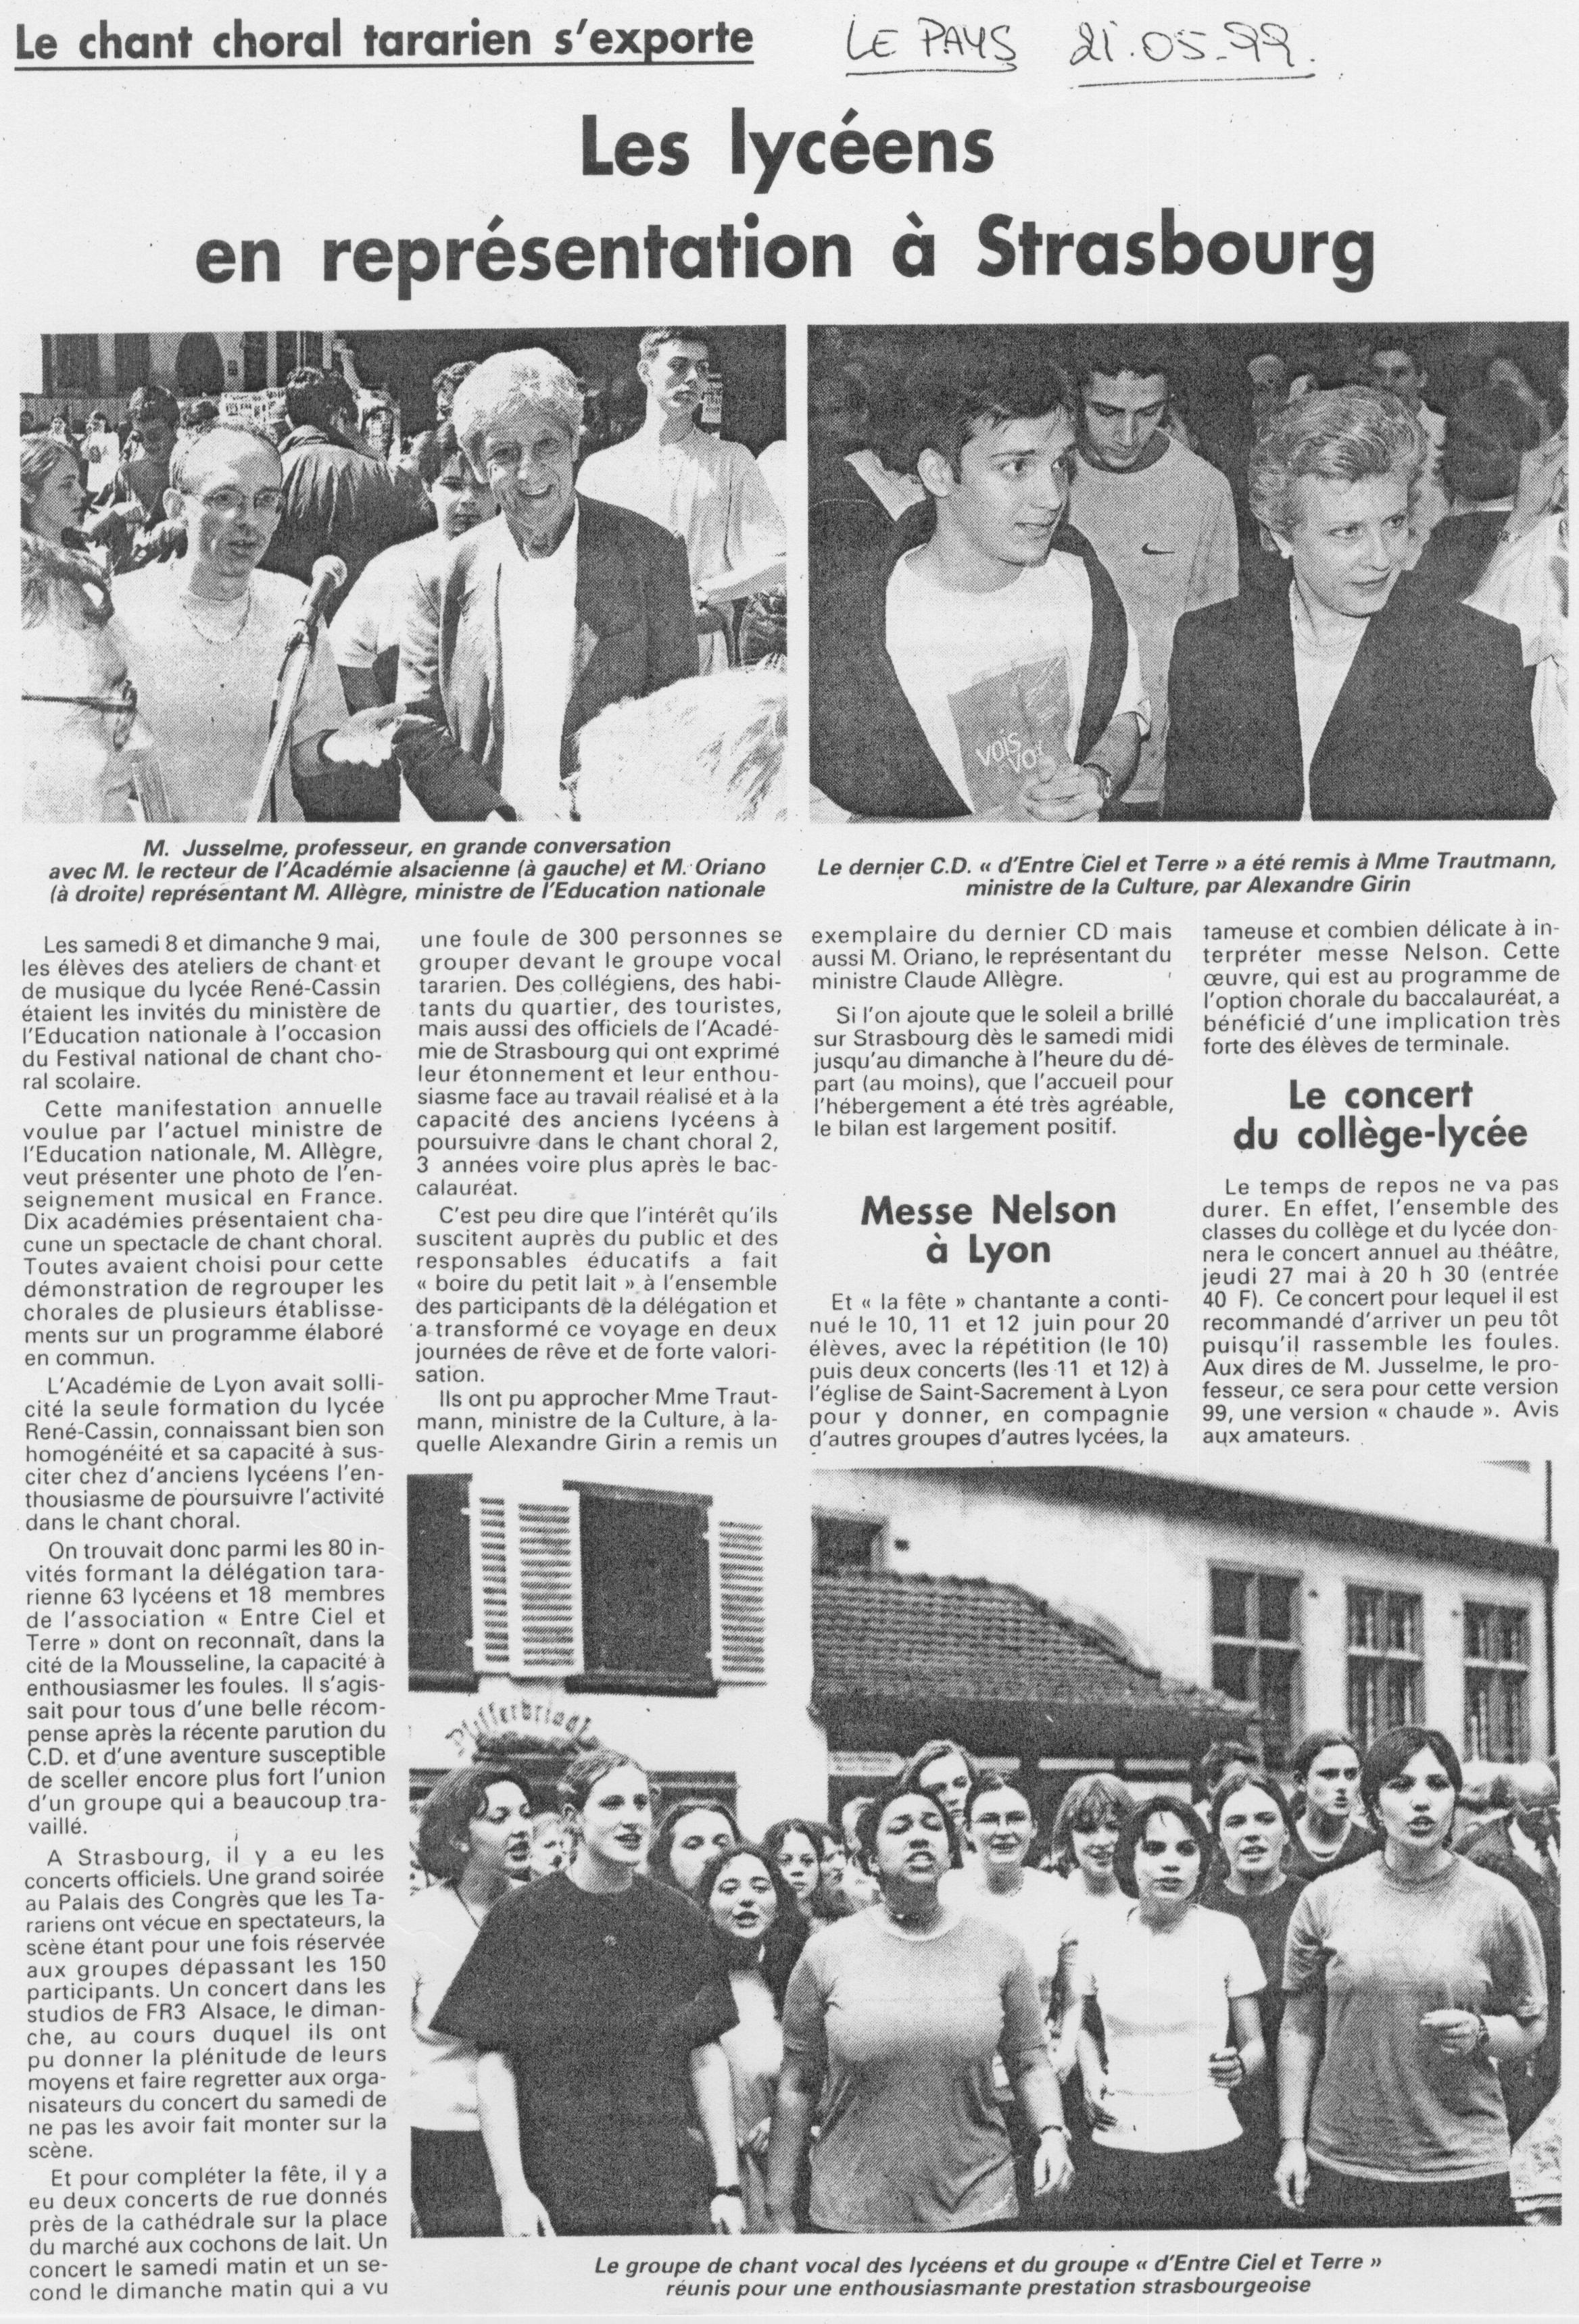 © Le Pays | 21 mai 1999